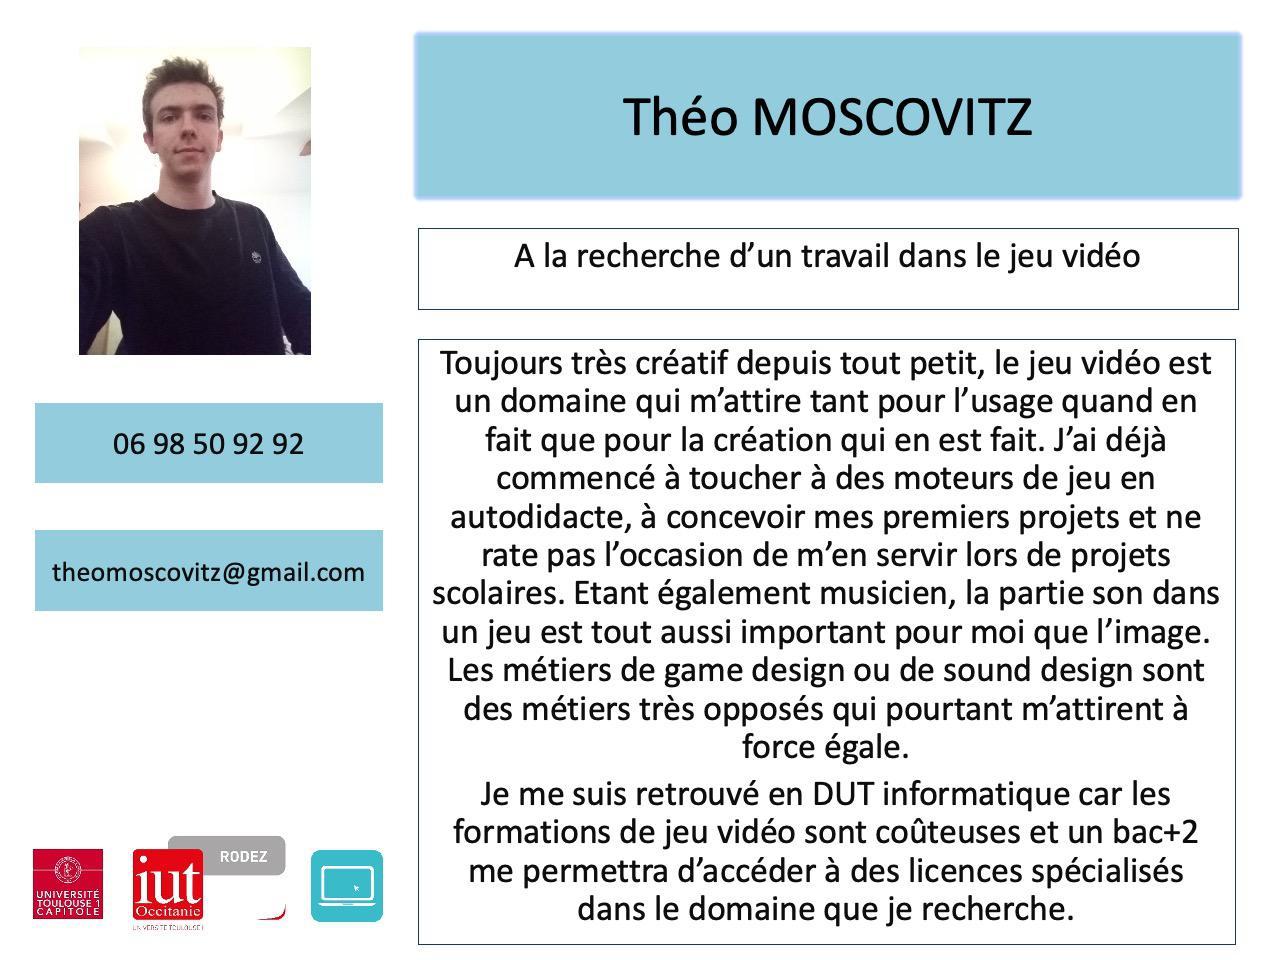 Theo Moscovitz